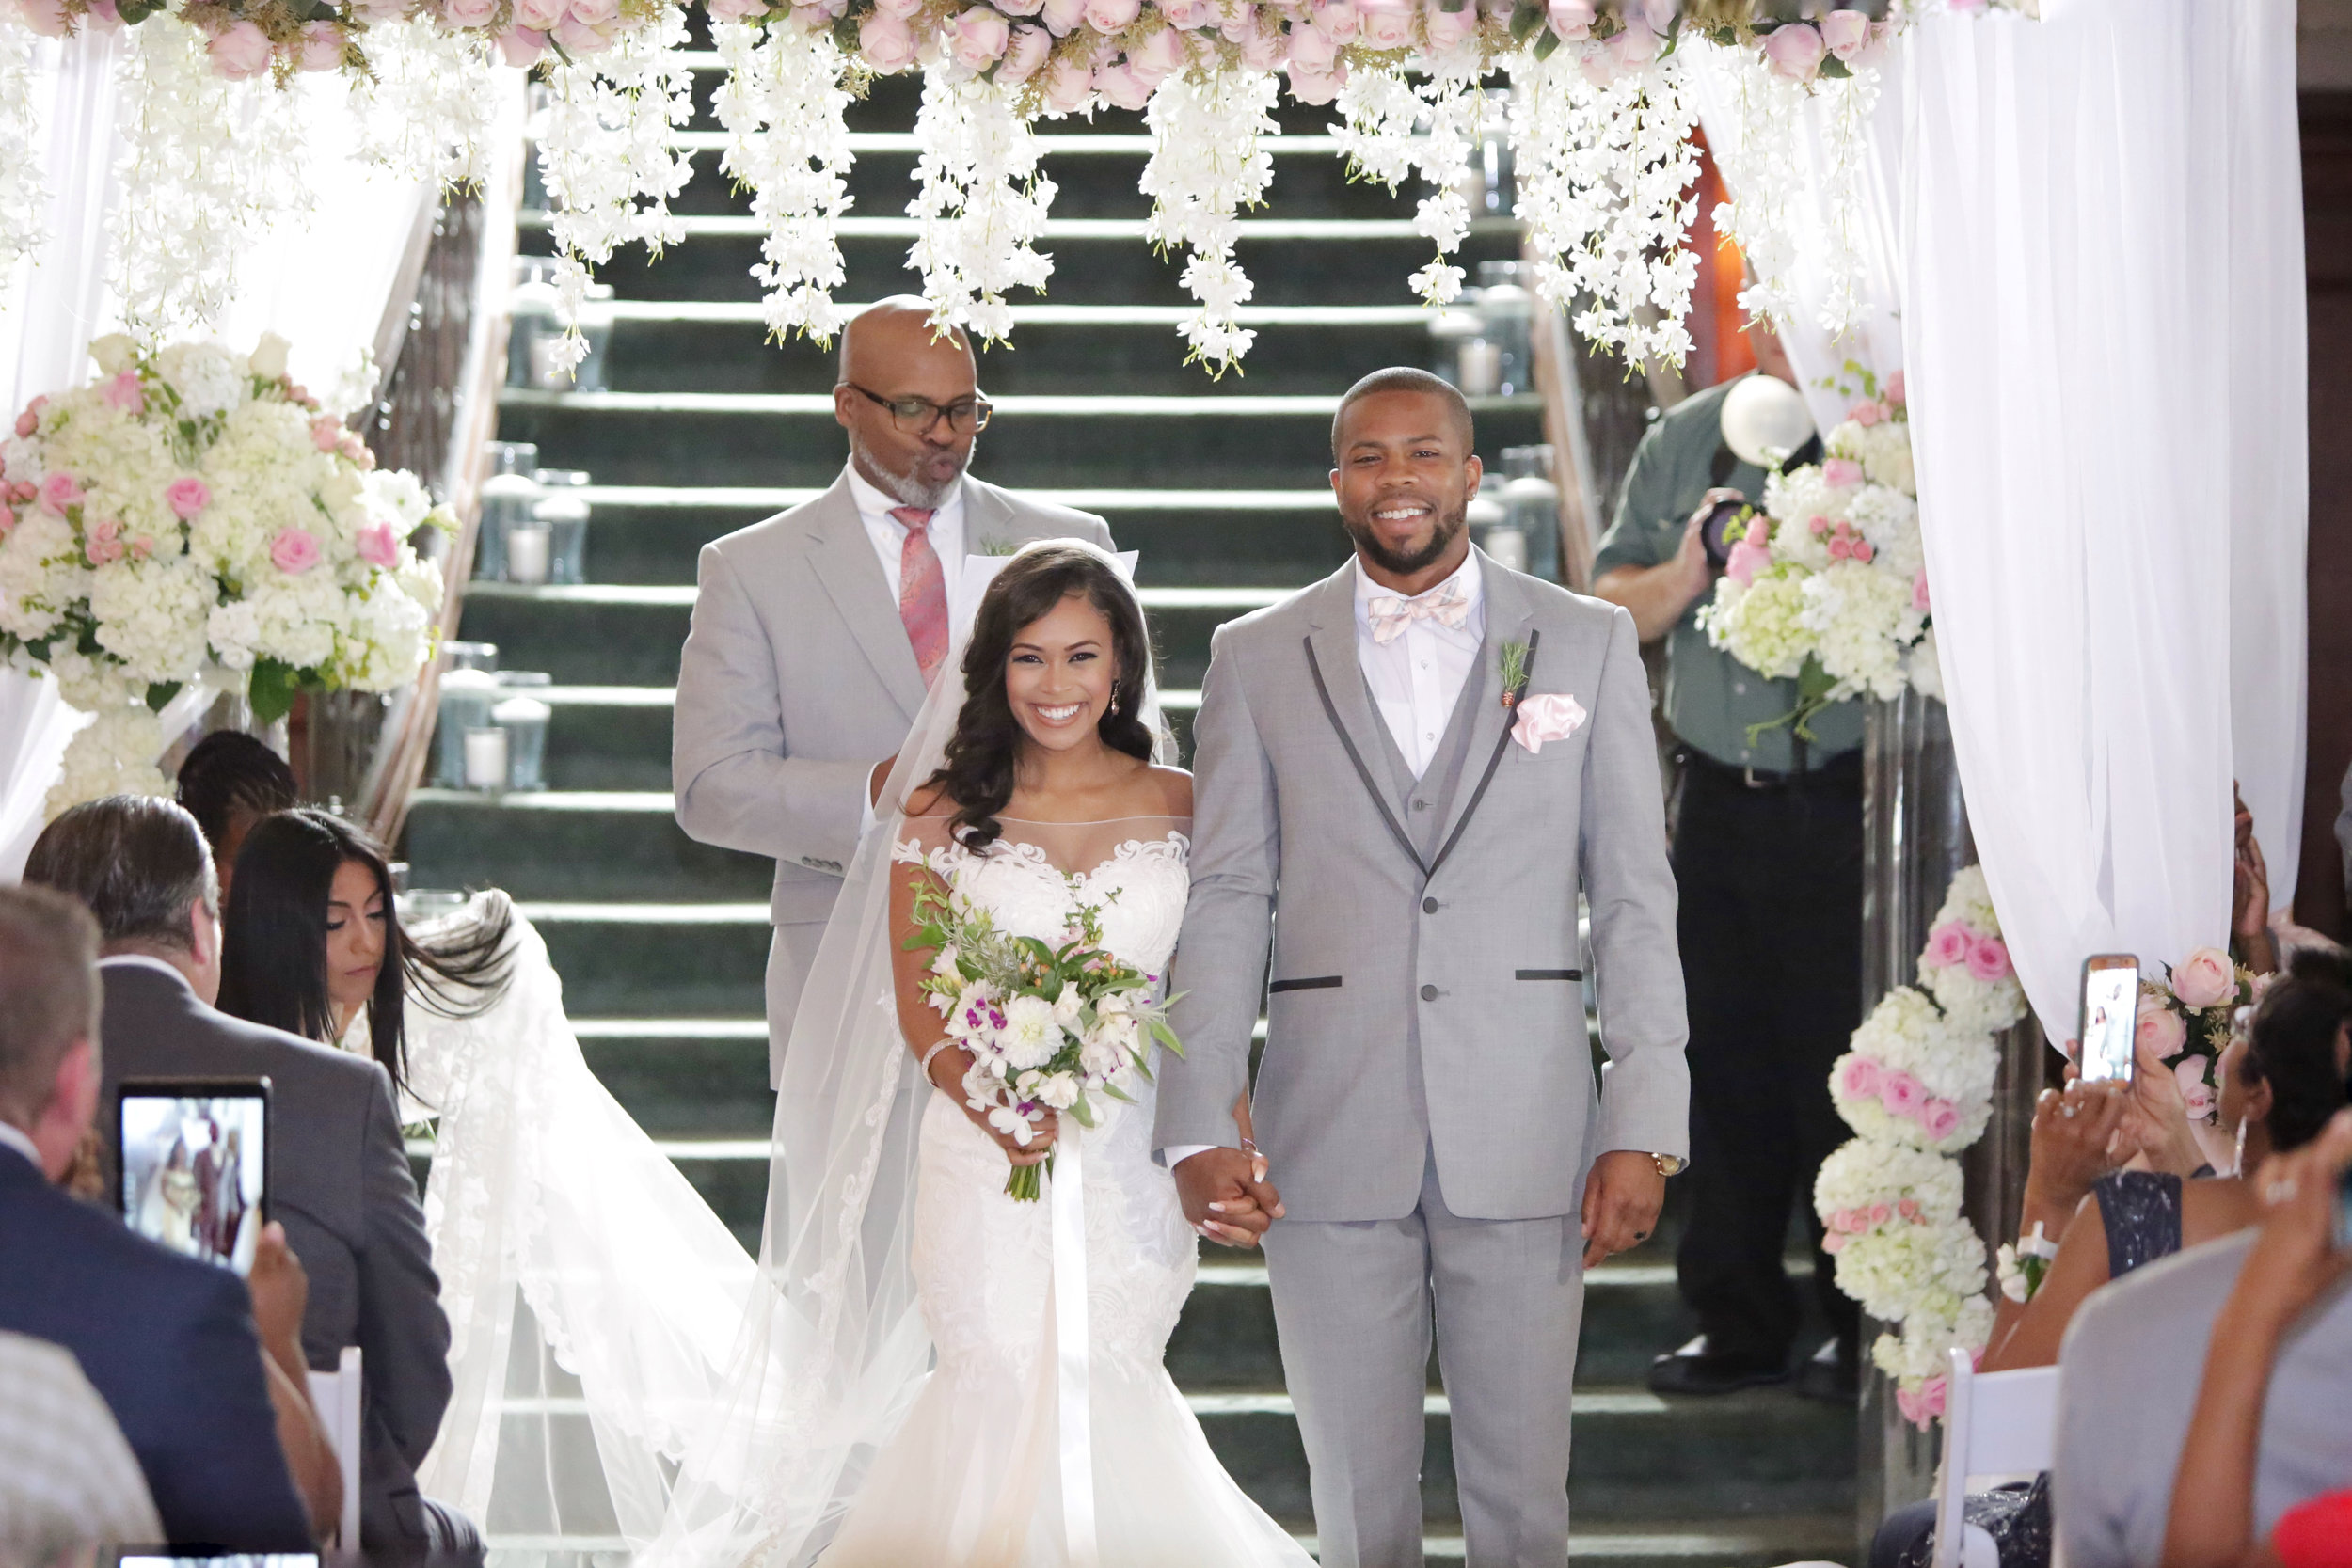 Christan_Imani_WeddingCeremony_24.jpg